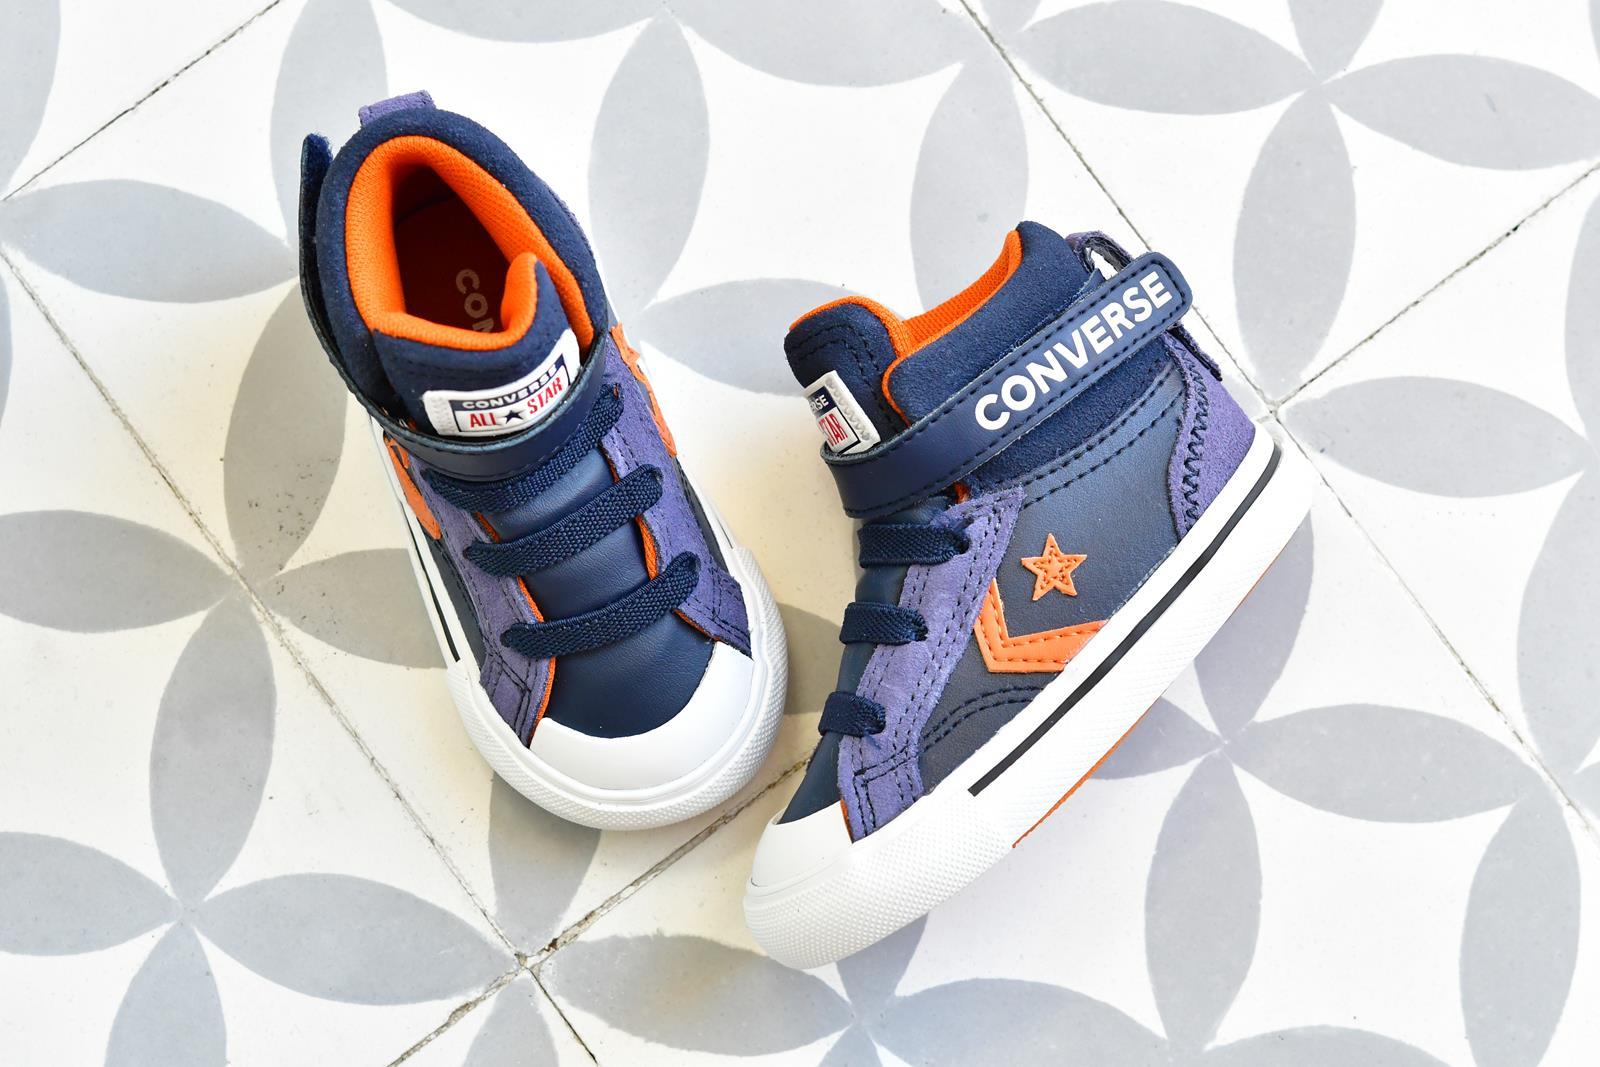 Botín Converse Pro Blaze Piel Azul Velcro Kids INF